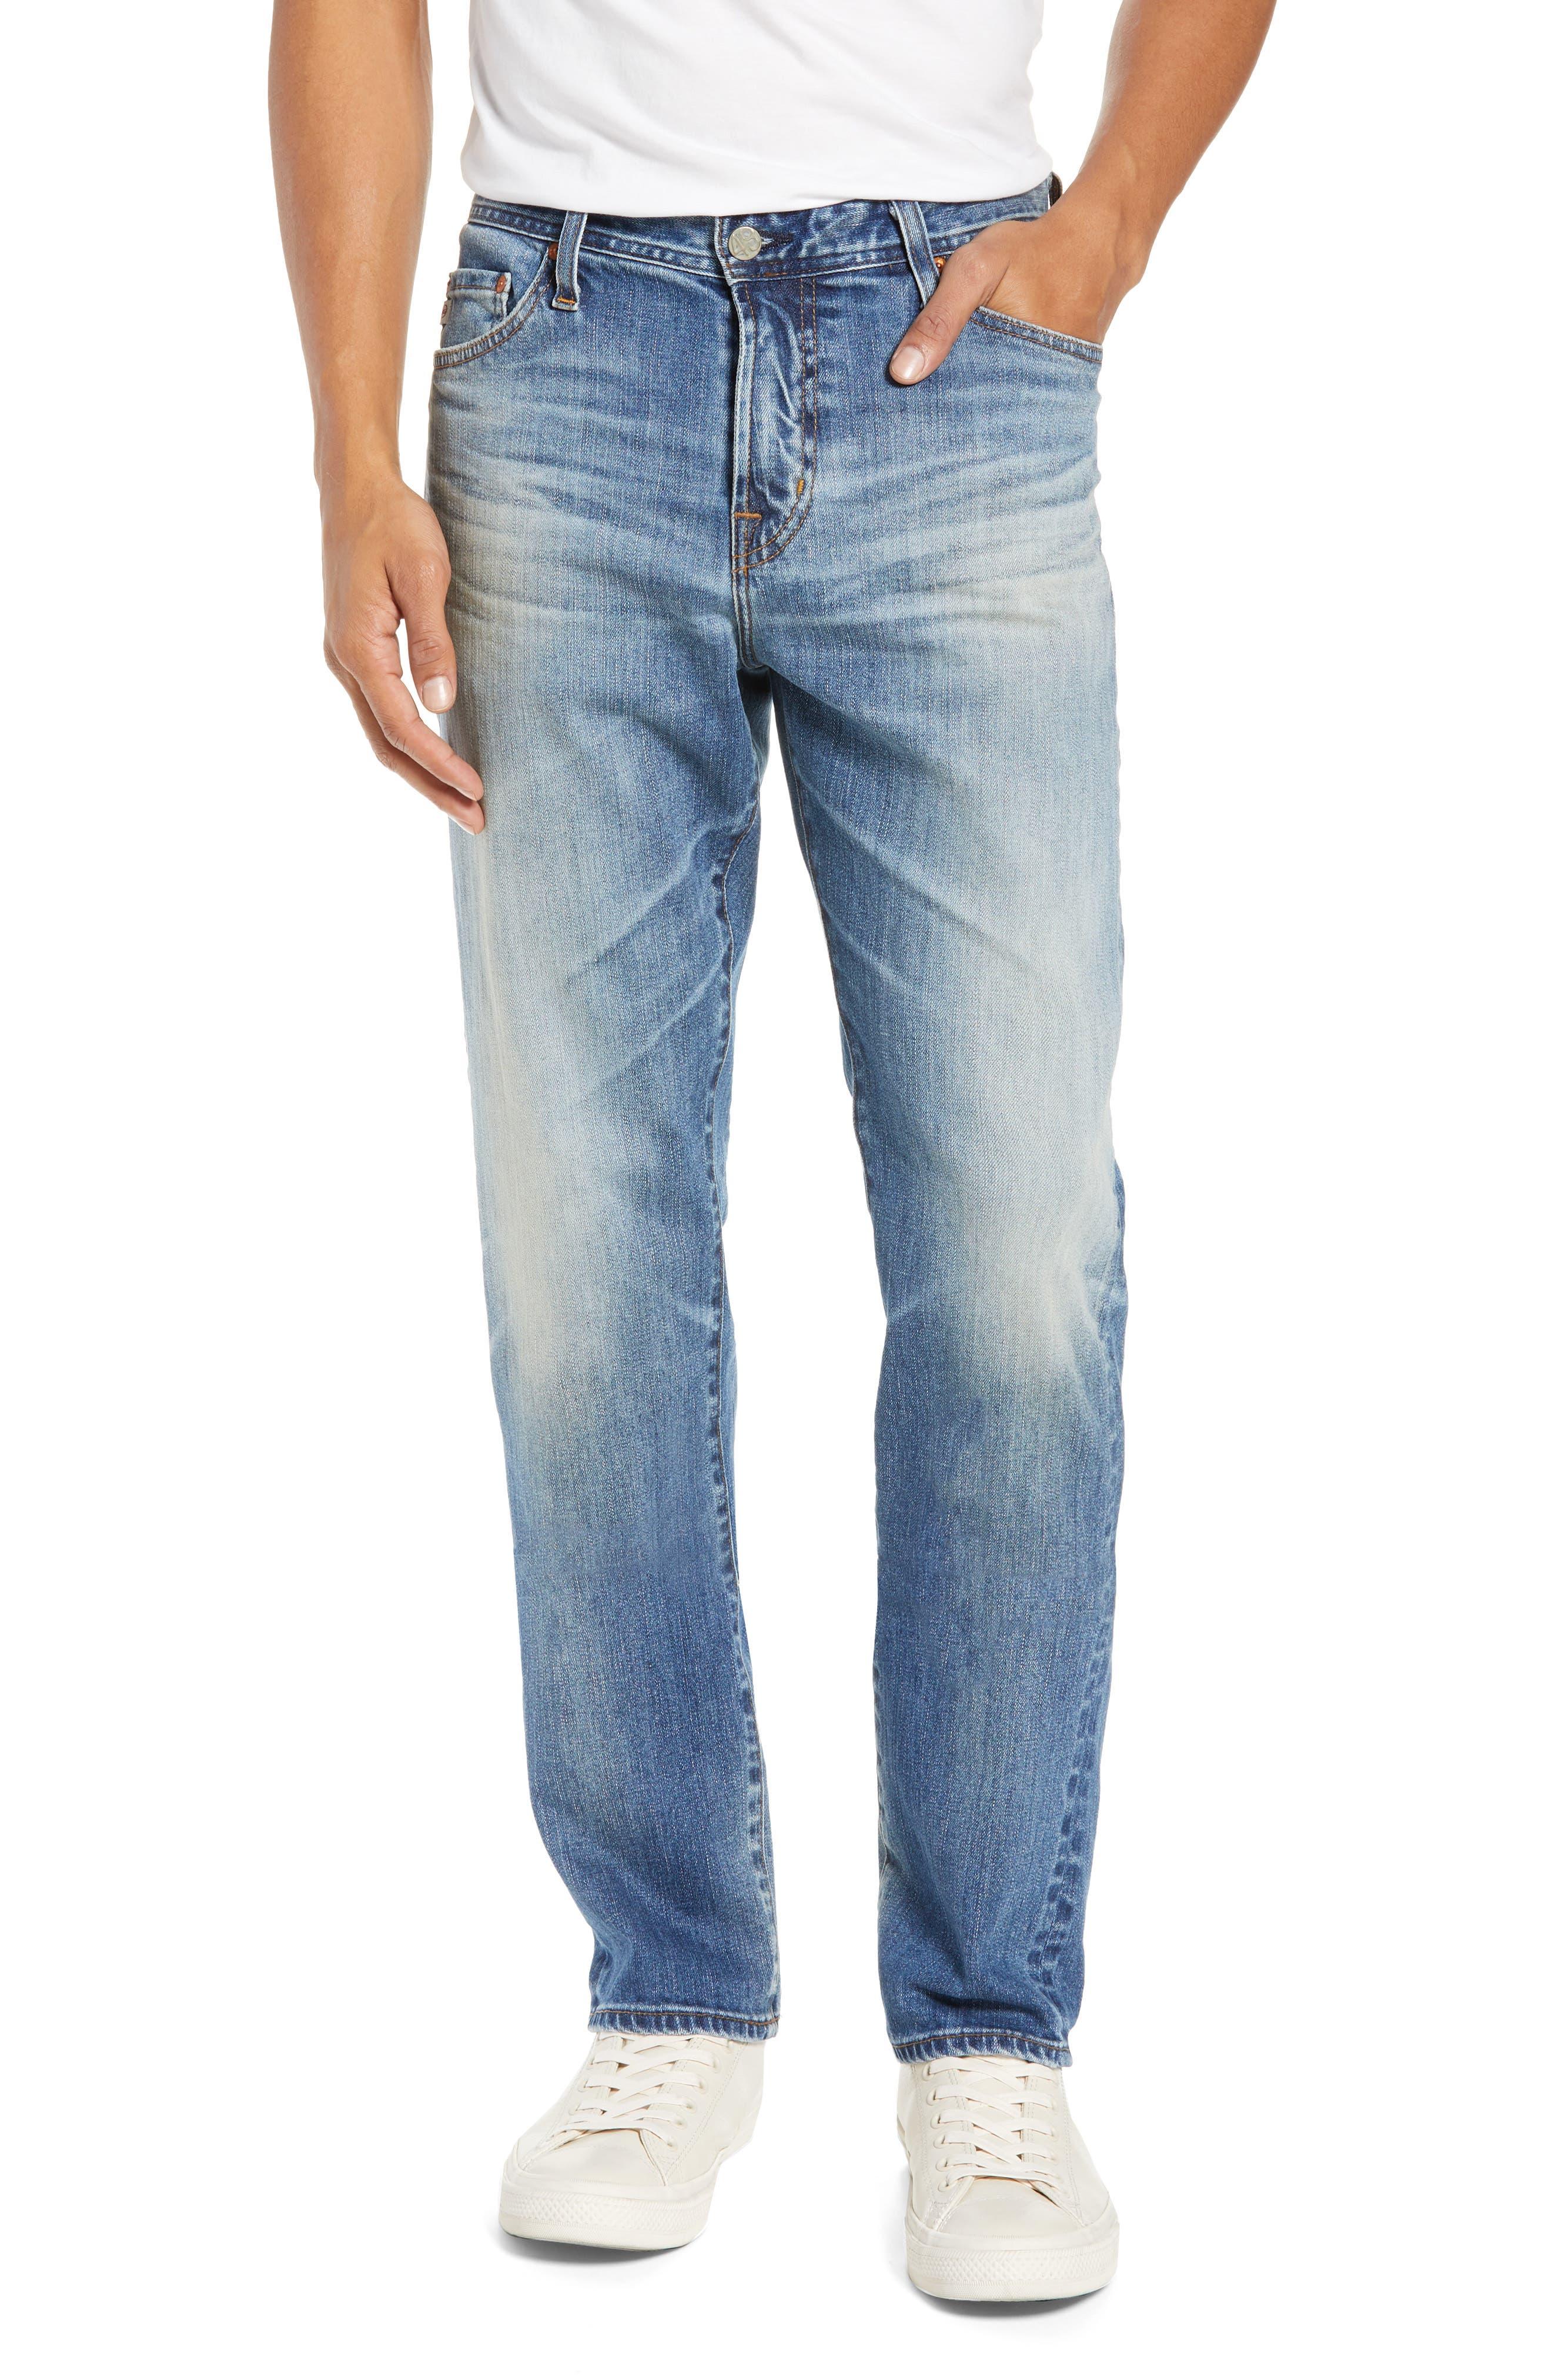 Everett Slim Straight Leg Jeans,                             Main thumbnail 1, color,                             21 YEARS SEIZE